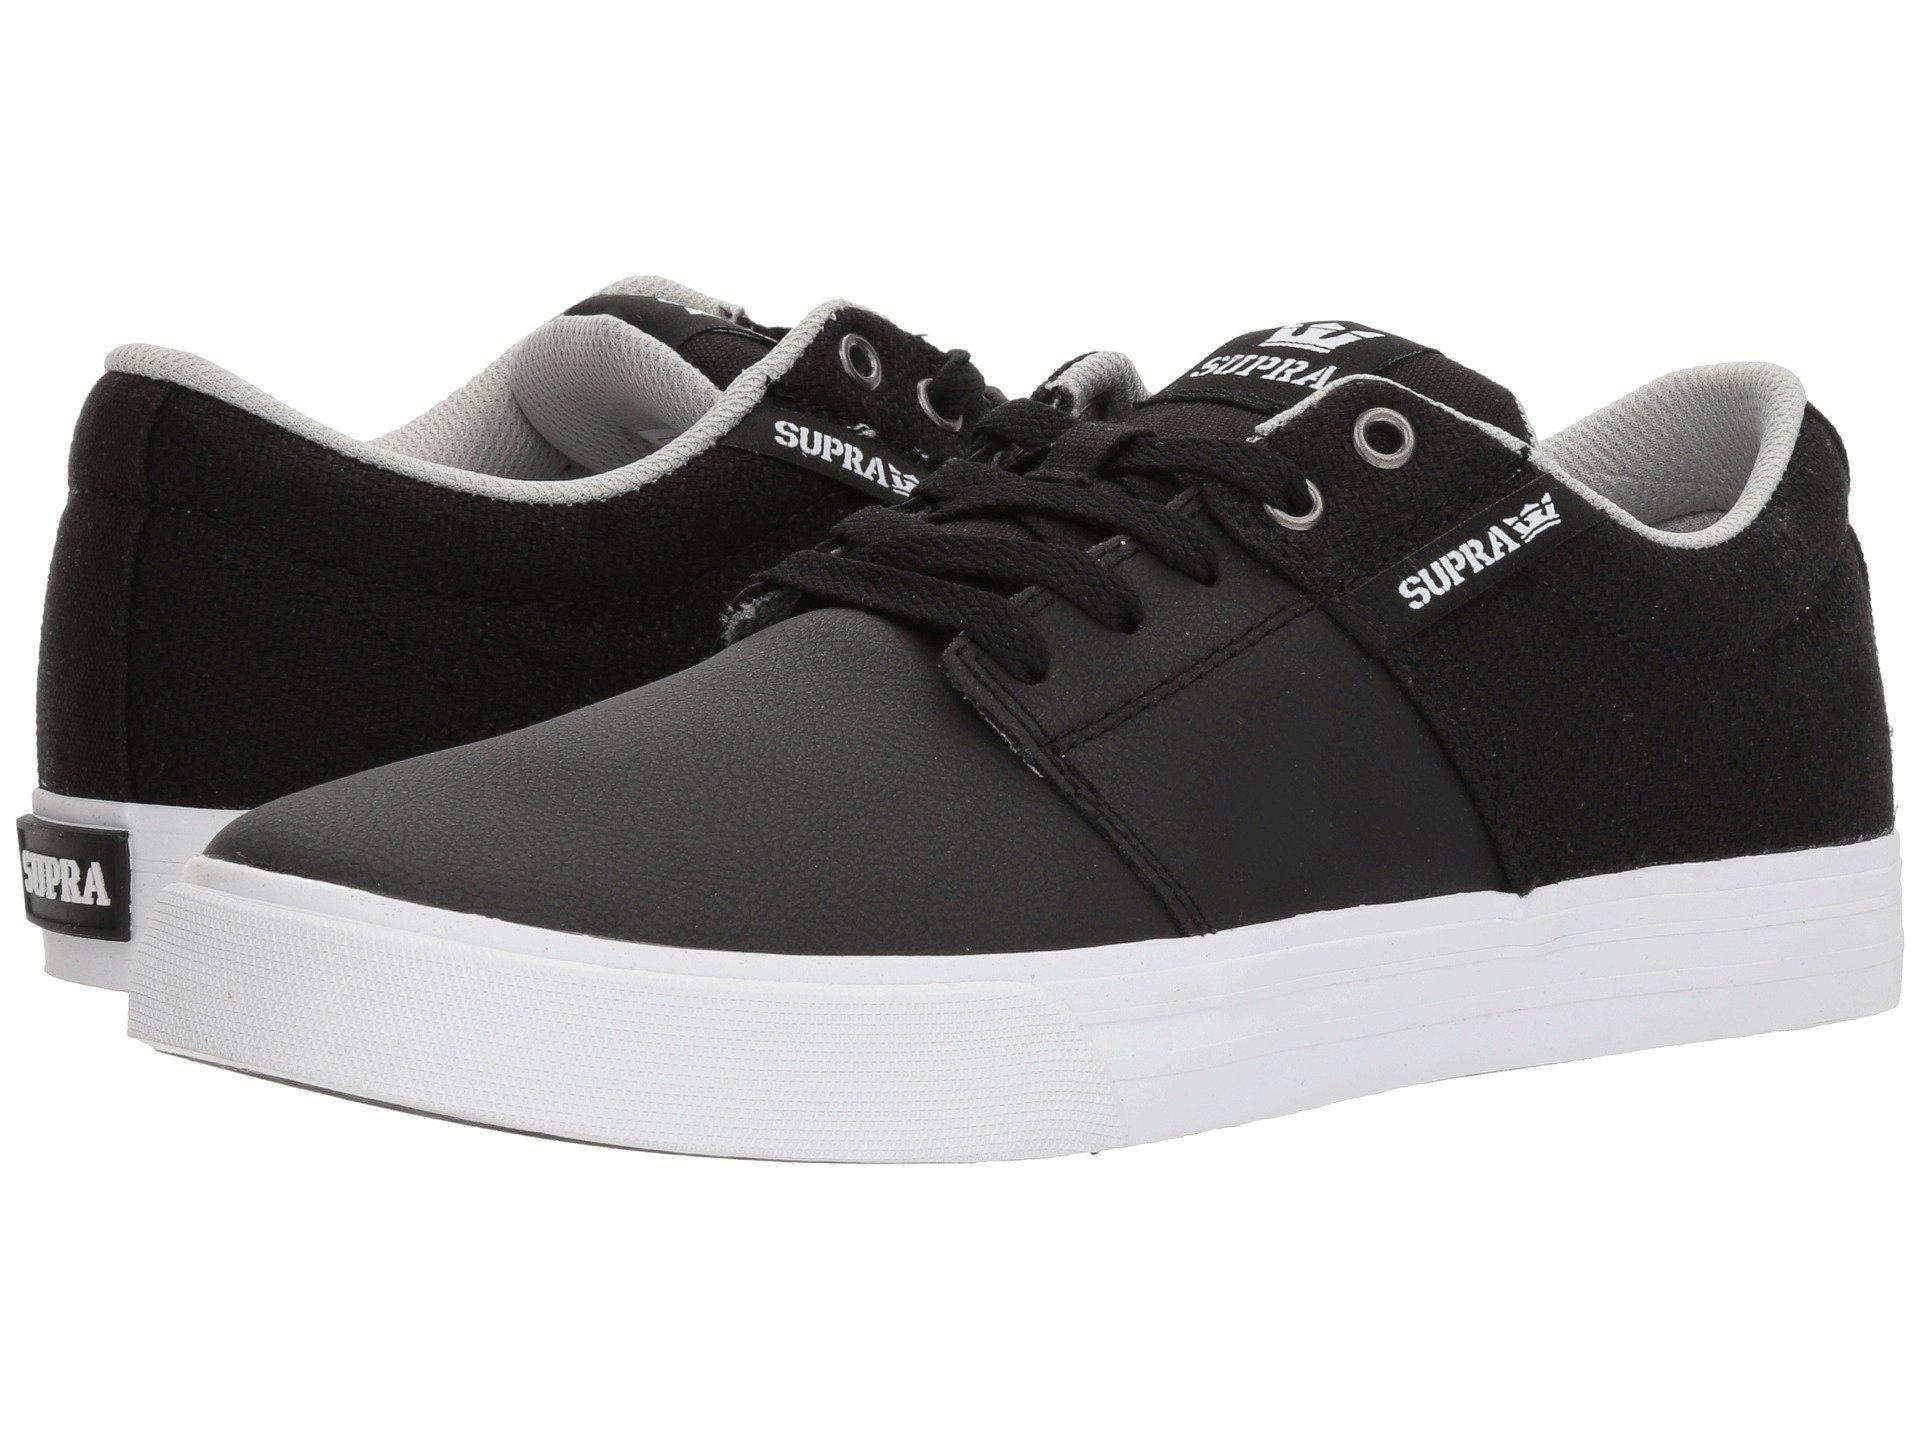 a31783058376 Lyst - Supra Stacks Vulc Ii (black gum) Men s Skate Shoes in Black ...